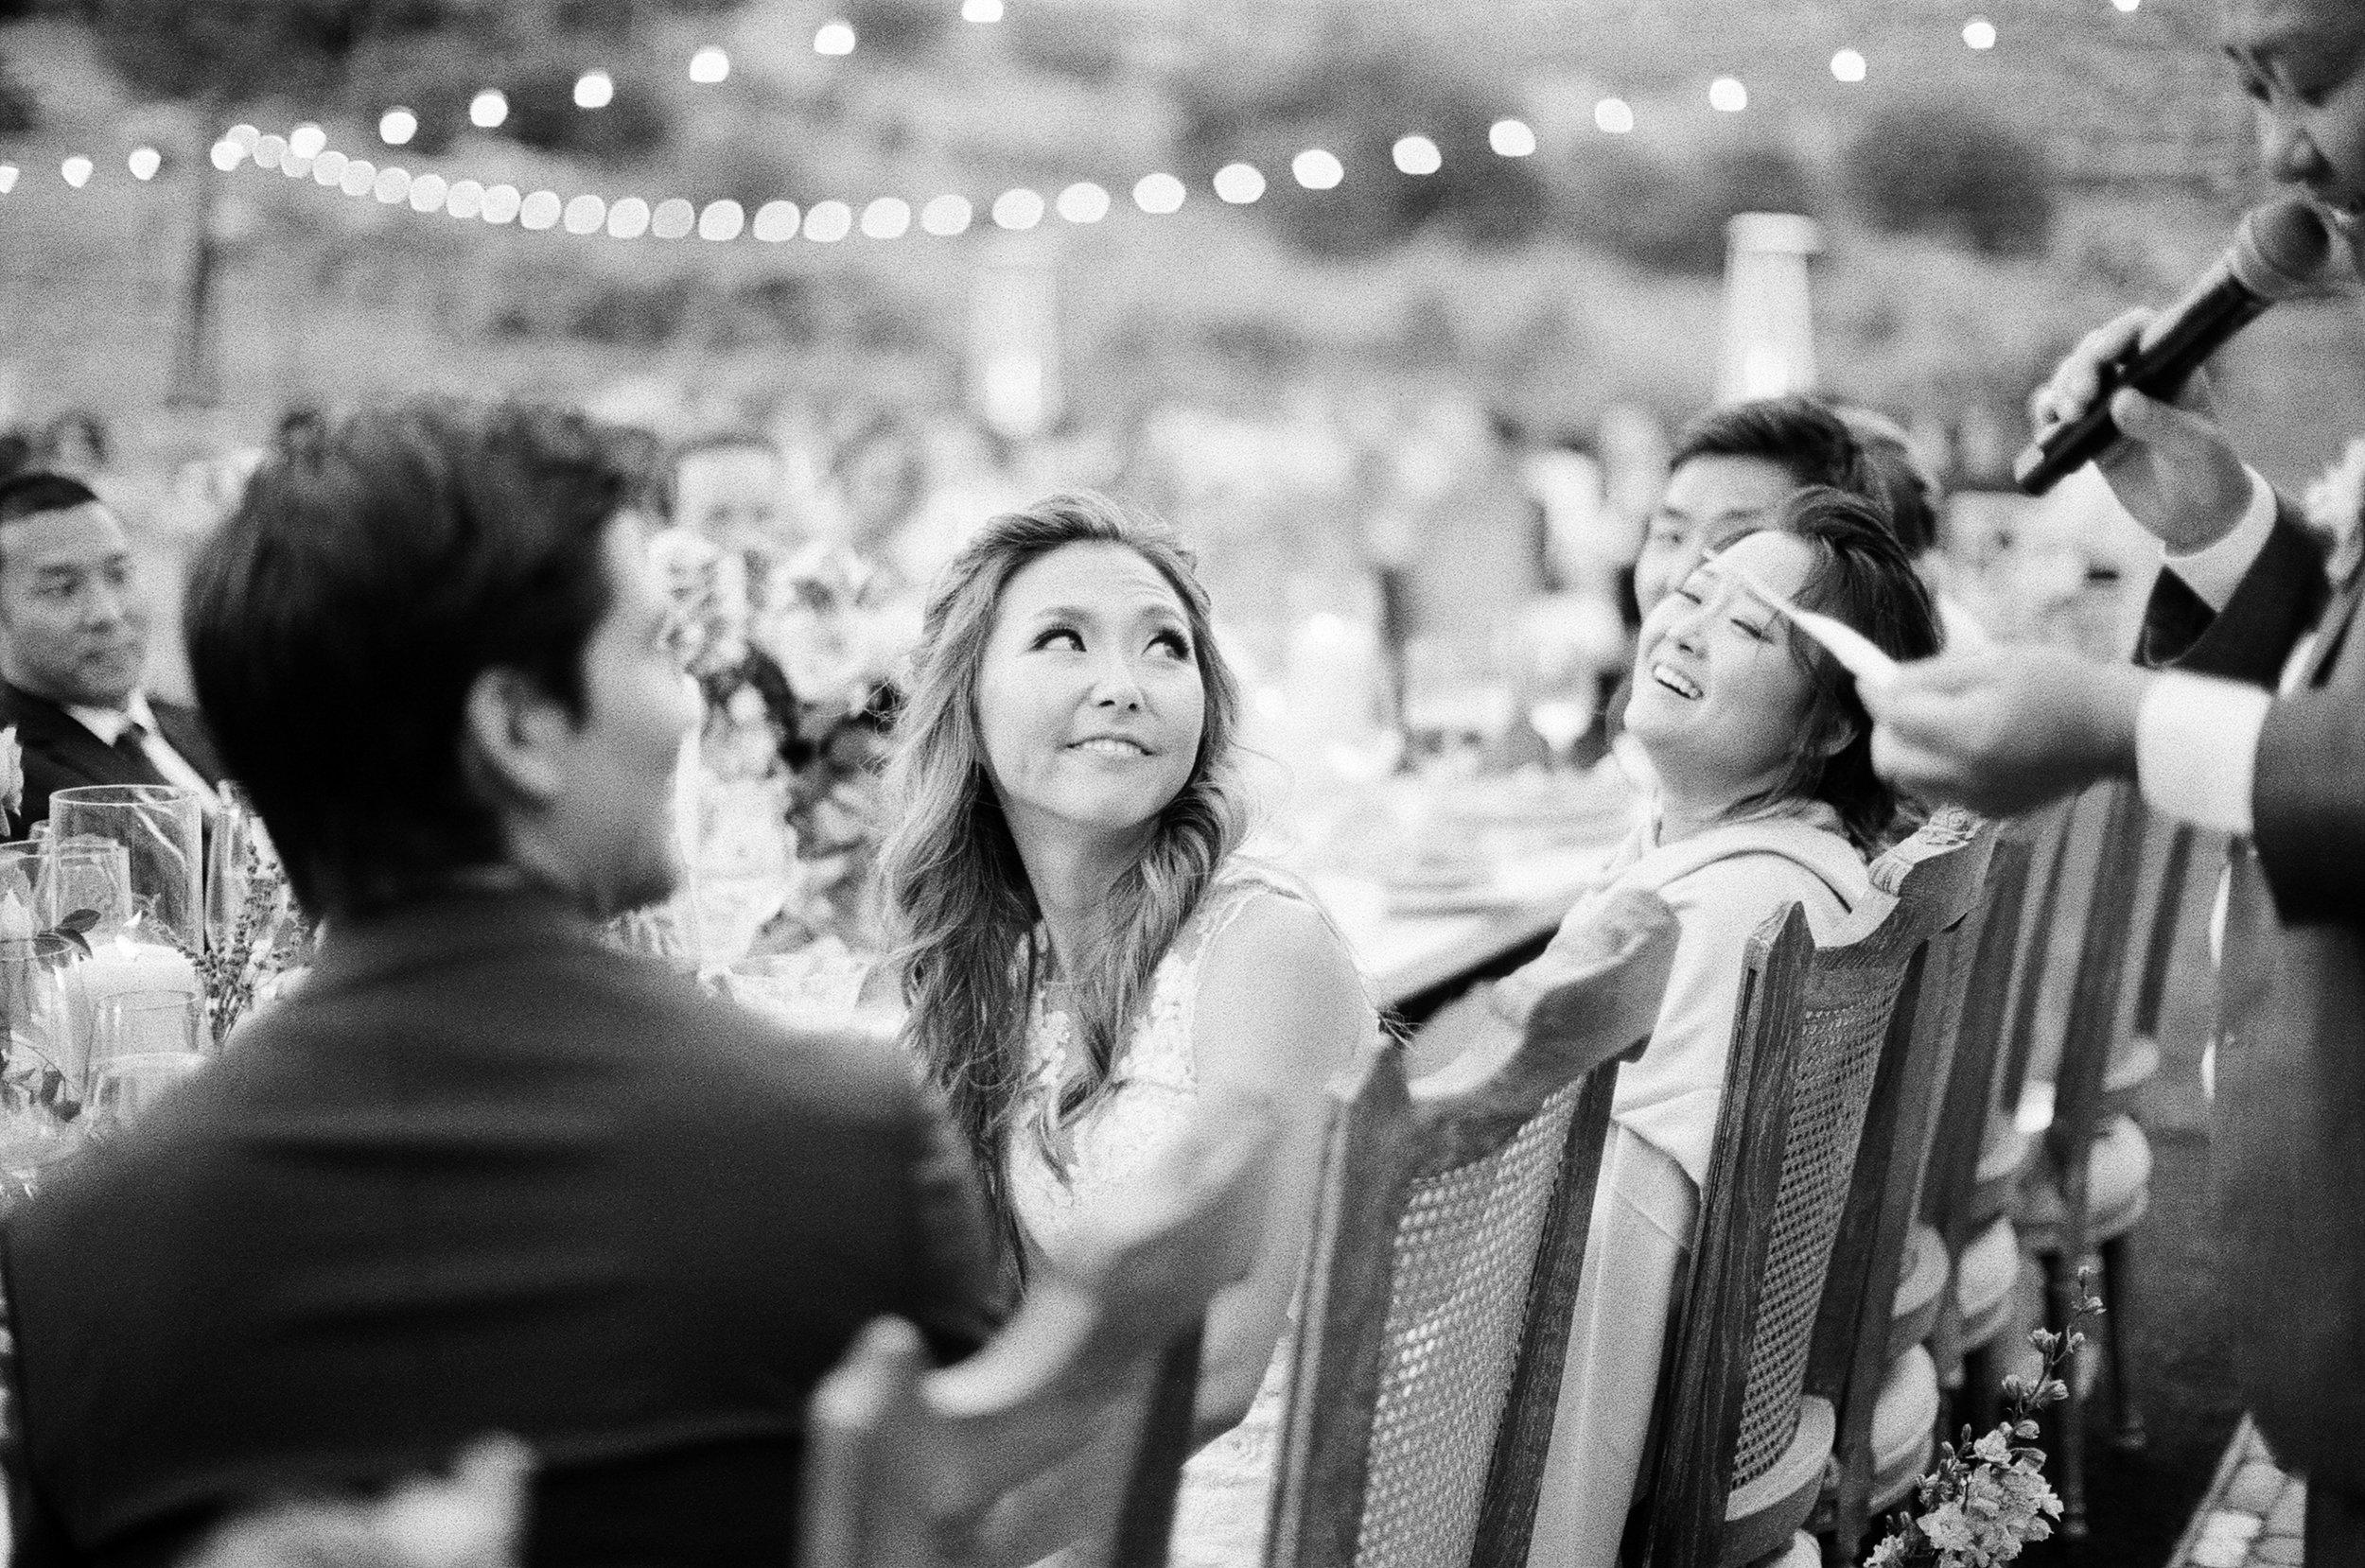 Triunfo_Creek_Winery_Wedding-267-Jen-Huang-JL_Jen_Huang_KB_(64).jpg